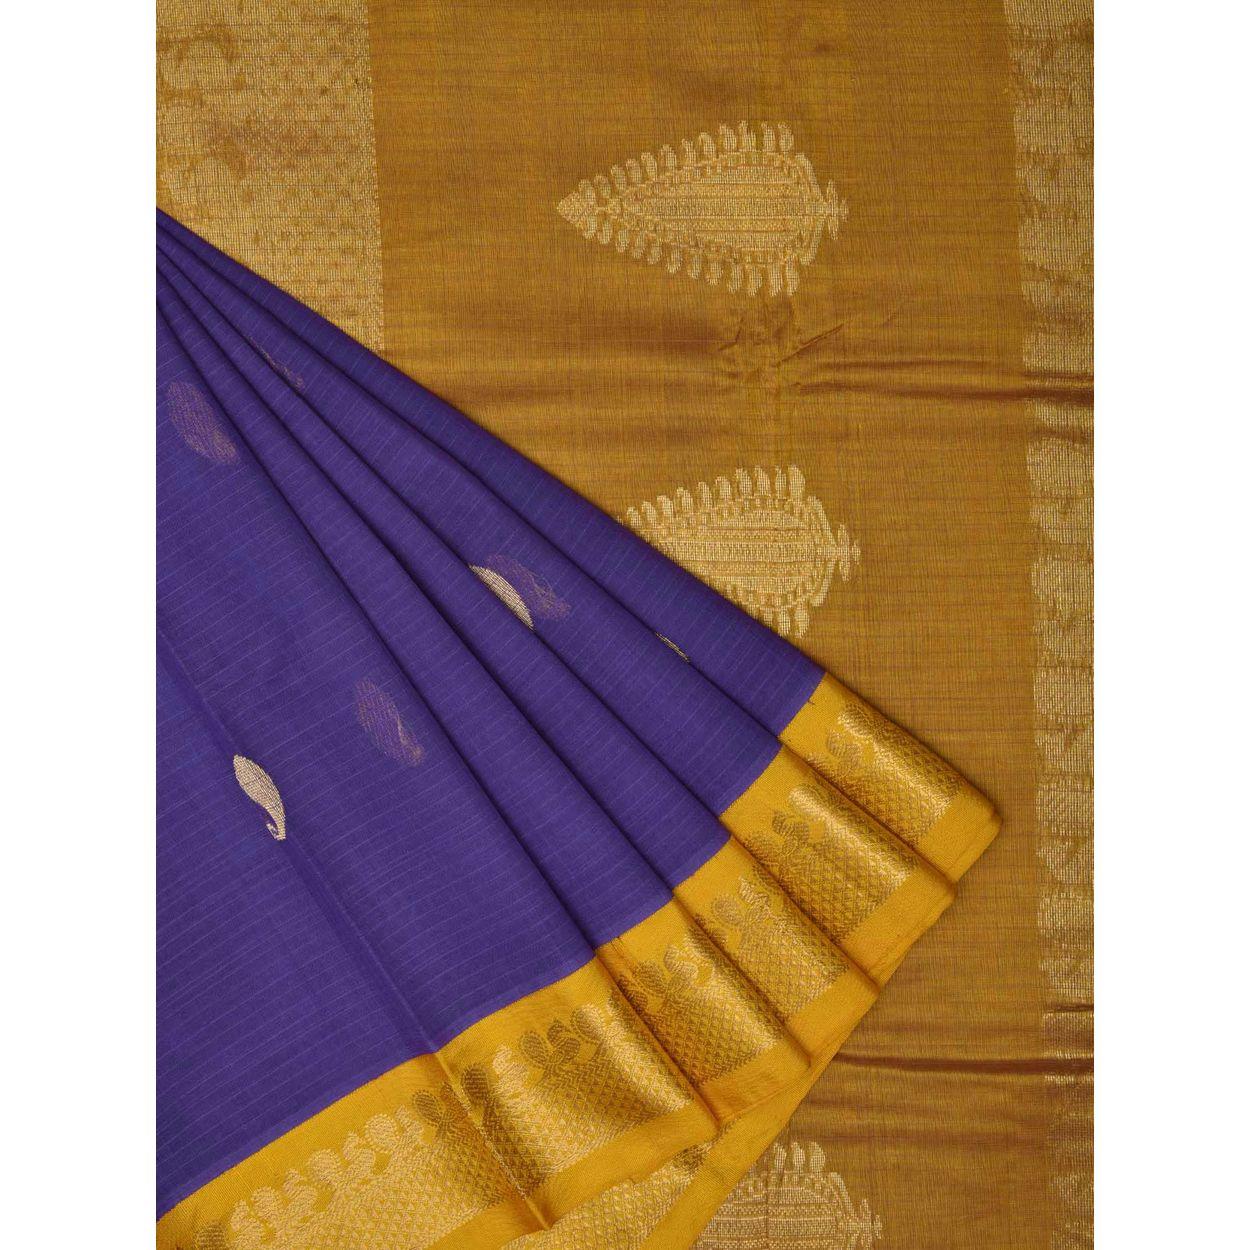 714455bef4e793 Lavender Color Sari | Gadwal Cotton Handloom Saree g0191